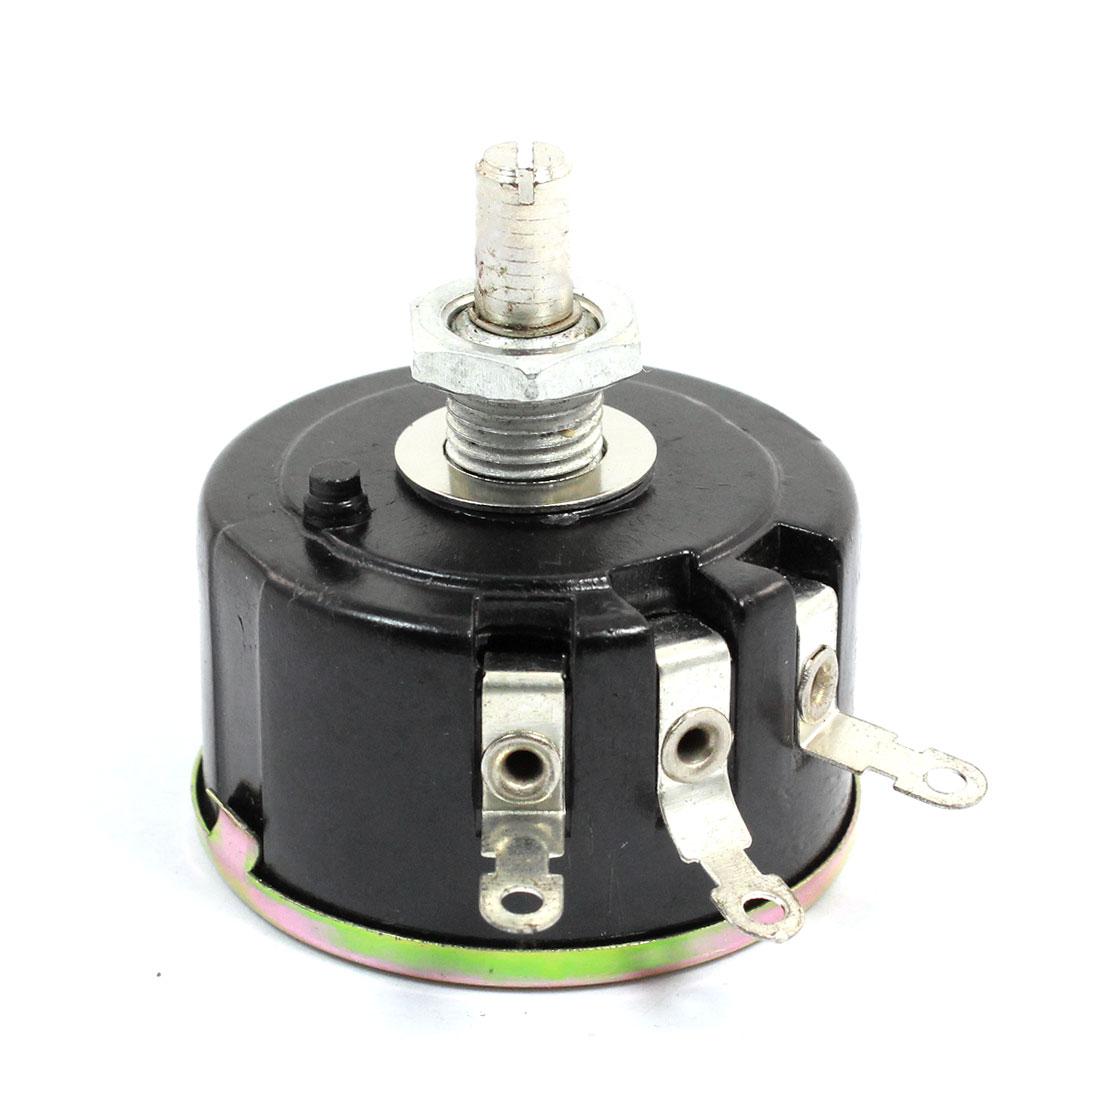 Full Size 47K Ohm 5W 5Watt Wire Wound Potentiometer Pot 42mm Body Diameter